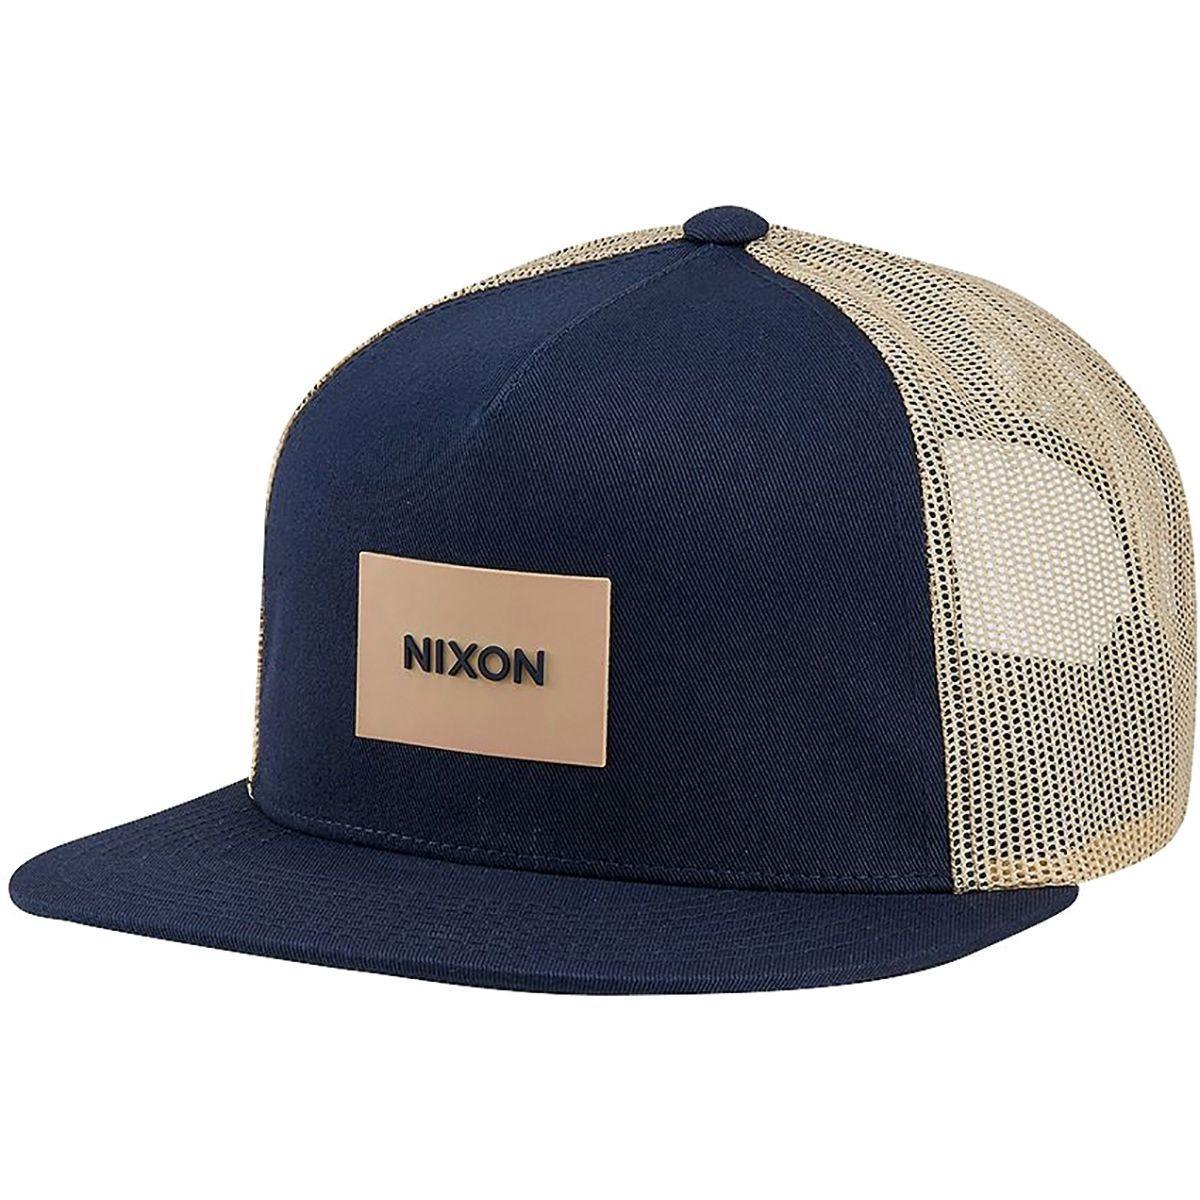 679bed9478f Lyst - Nixon Team Trucker Hat in Blue for Men